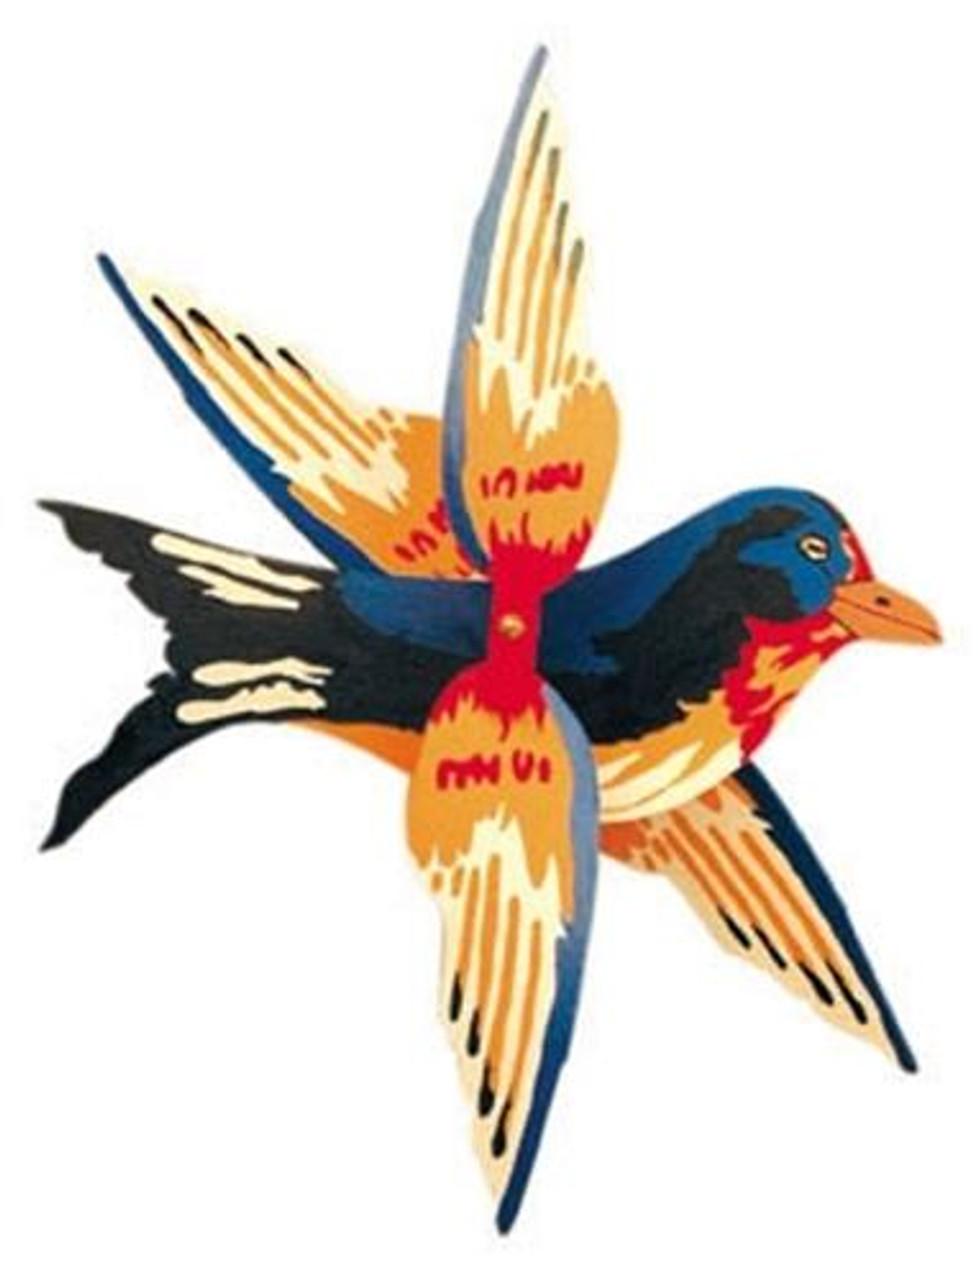 Cherry Tree Toys Barn Swallow Whirligig DIY Kit